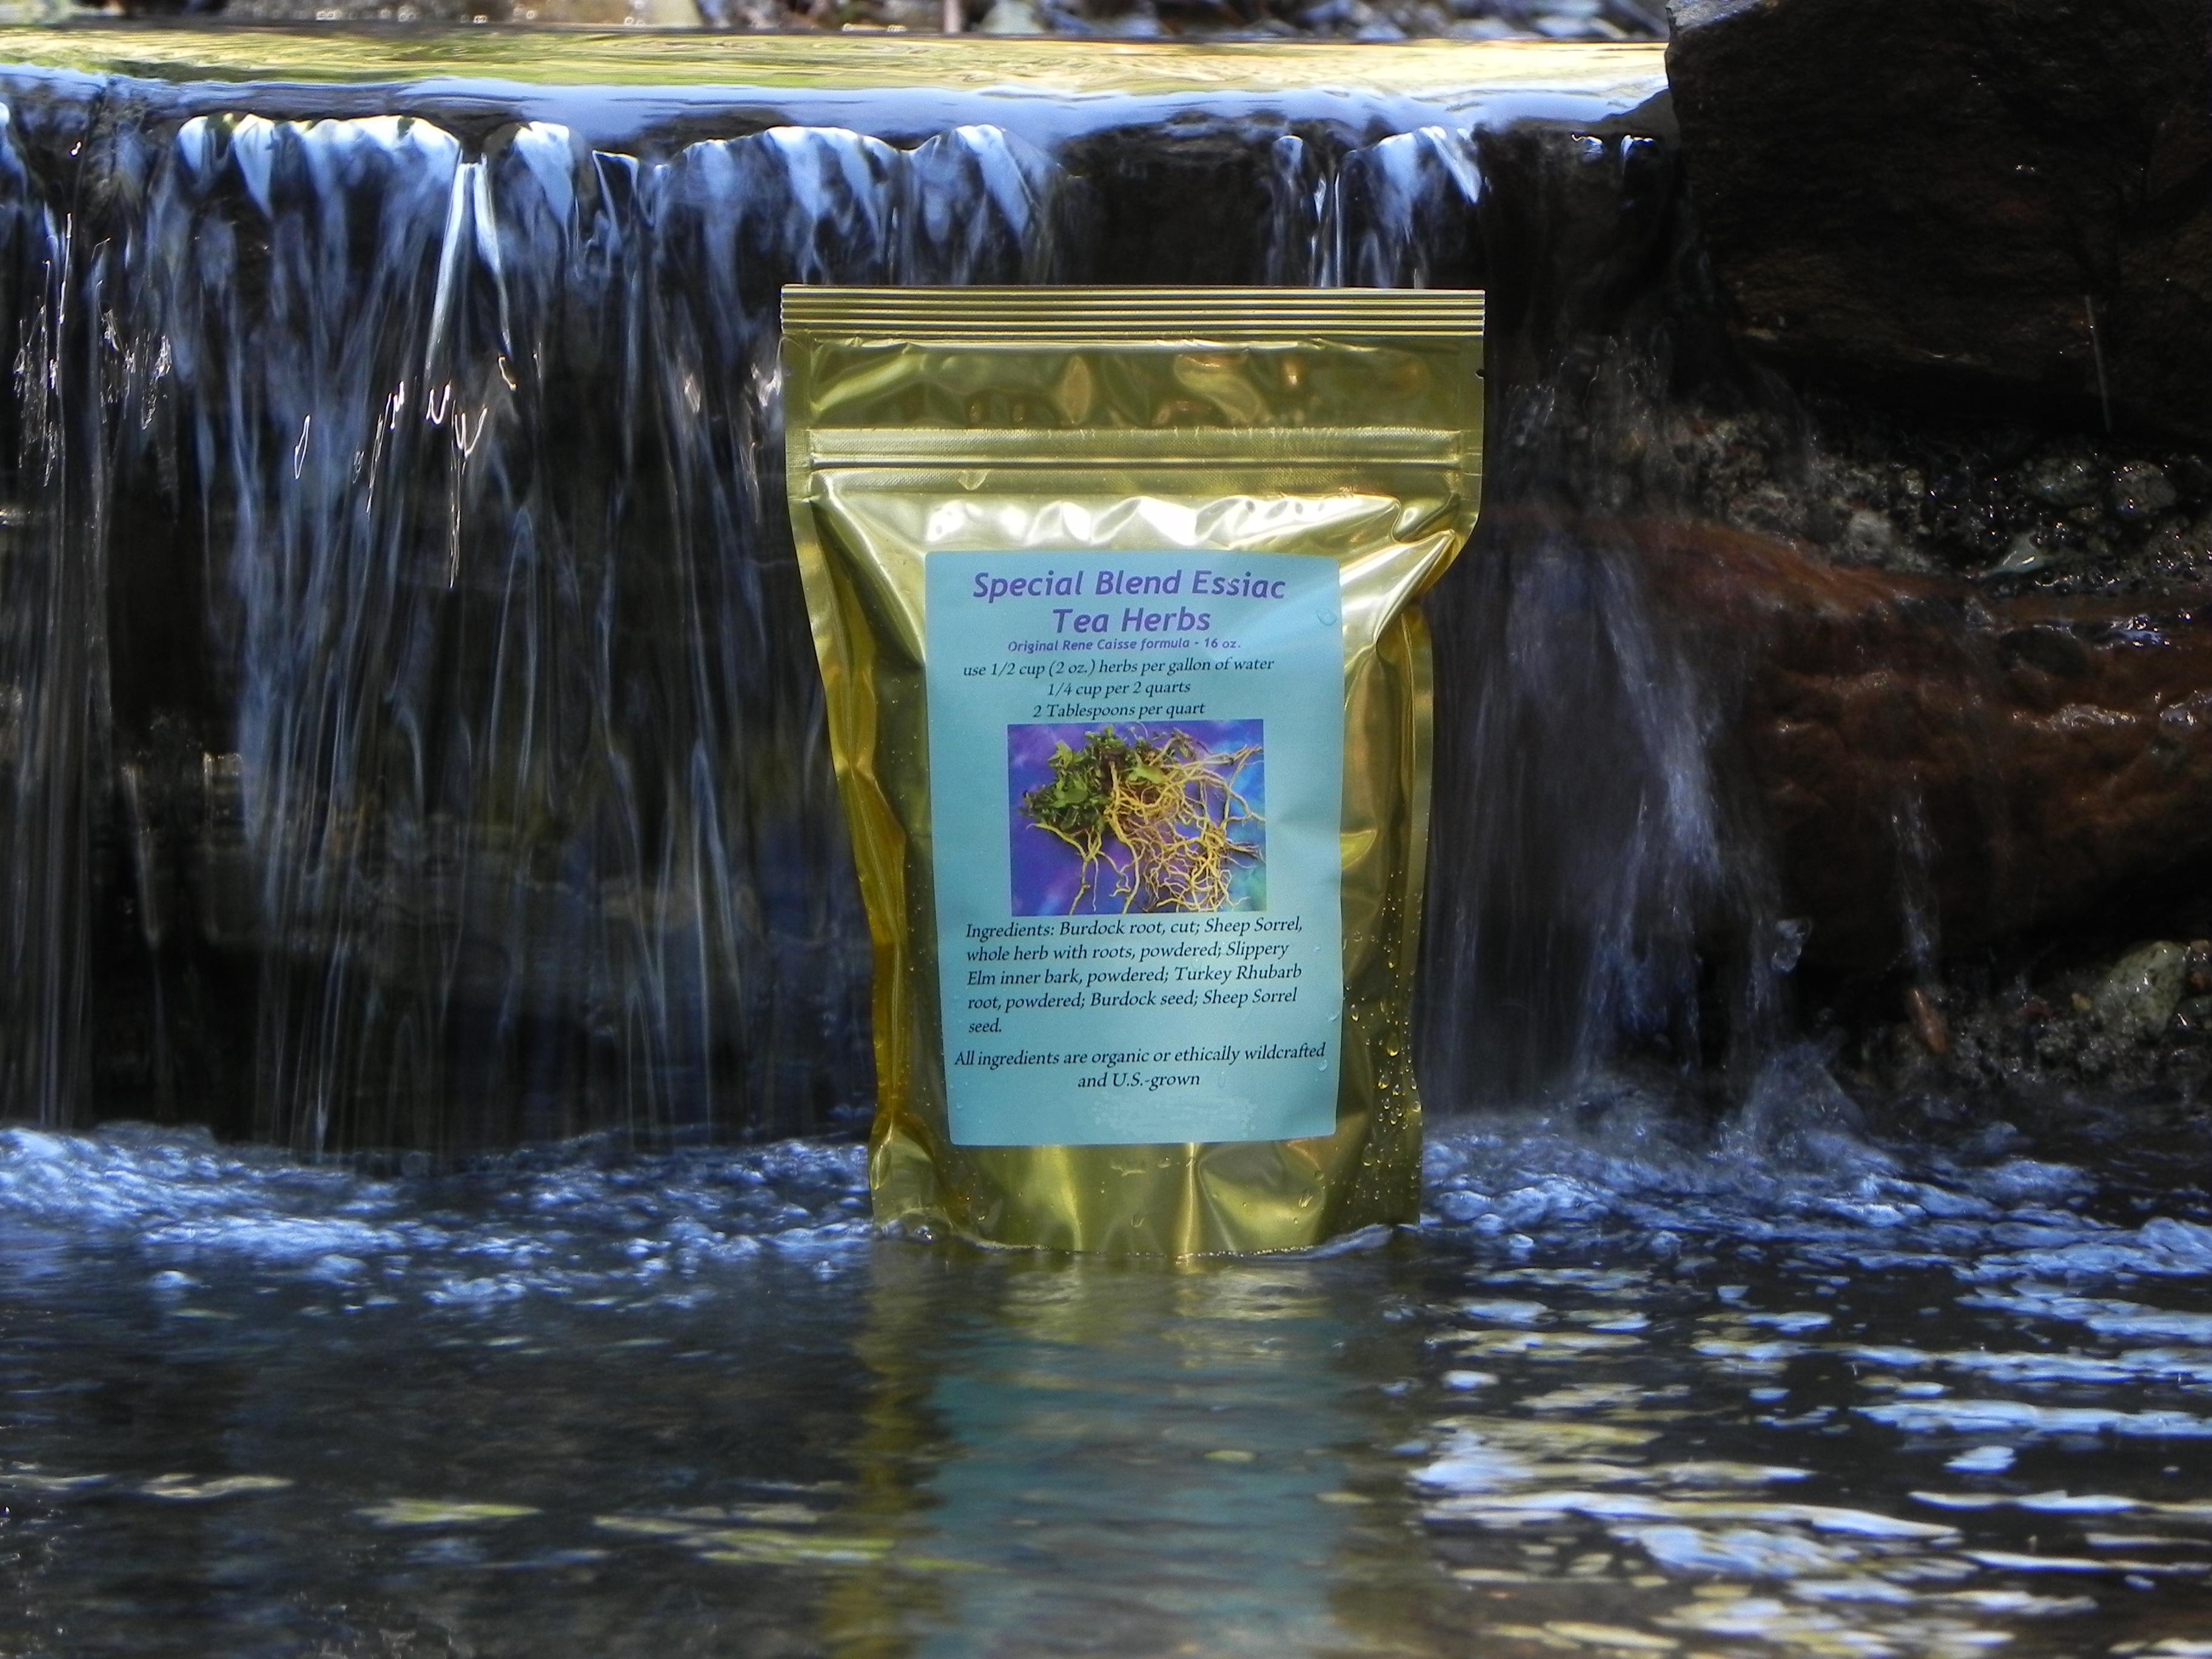 Cancer cure essiac herbal tea - Cancer Cure Essiac Herbal Tea 37